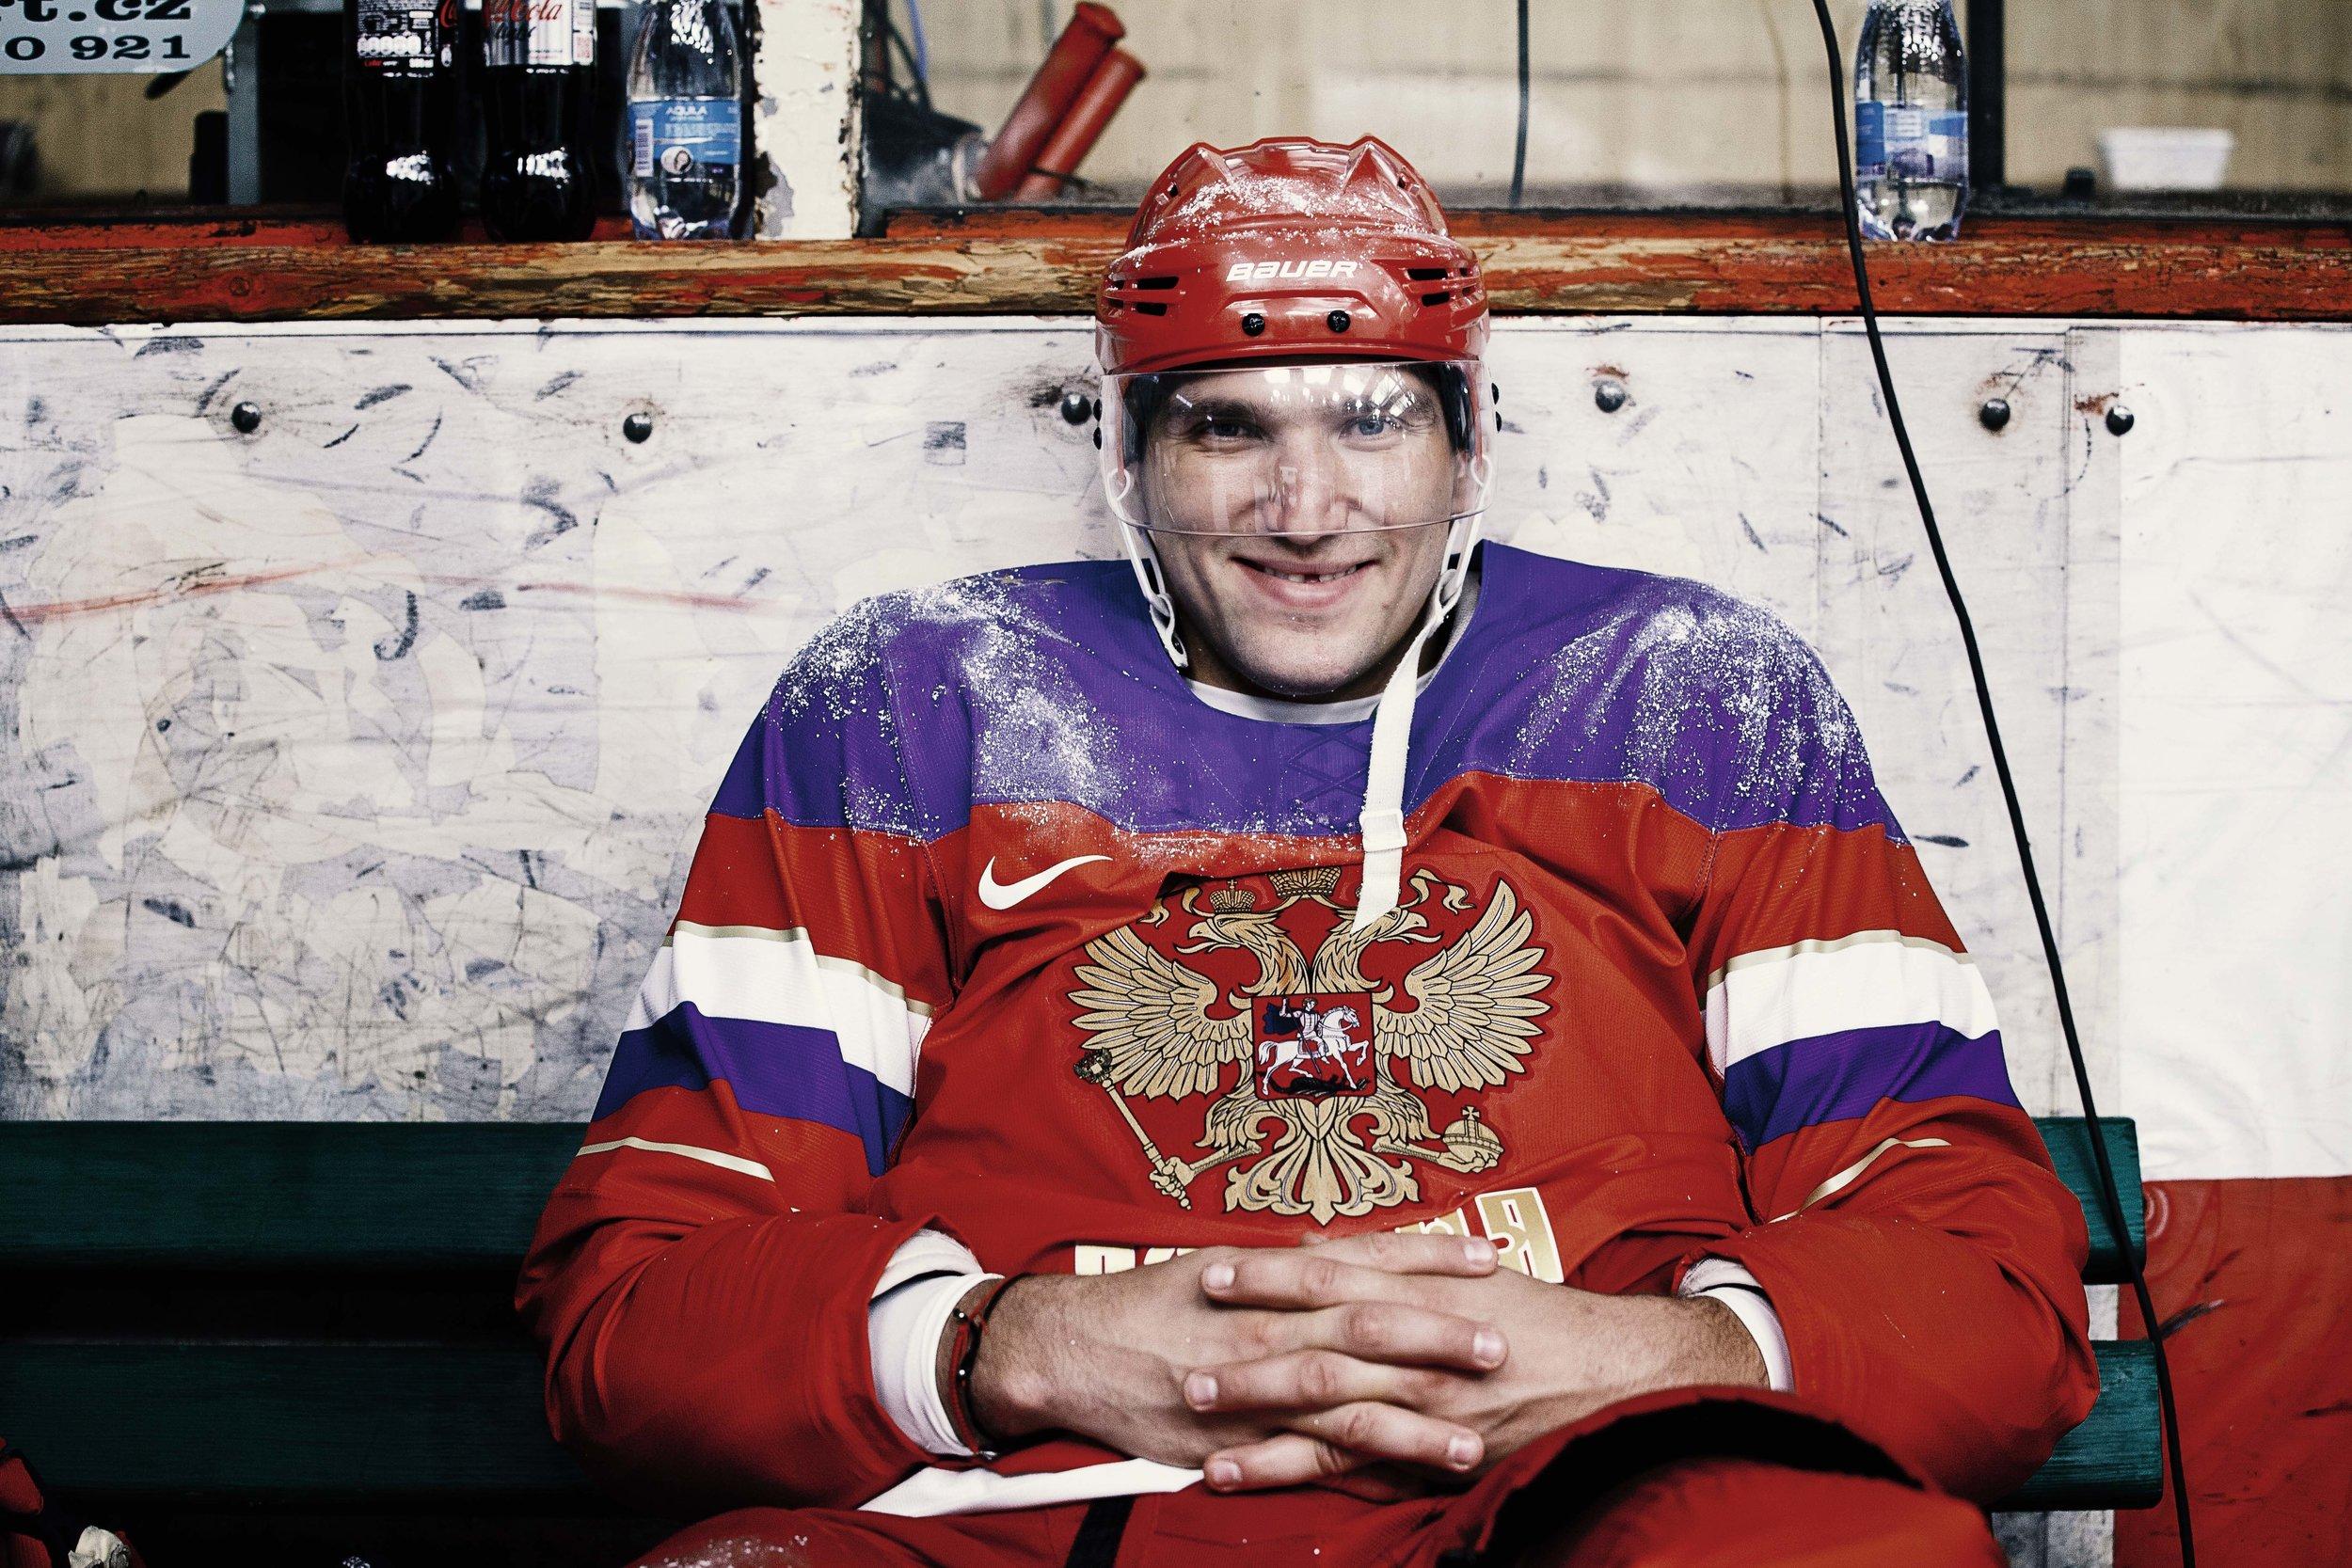 NIKE-RUSSIA-DAY3-SELECTS-FINAL29.jpg